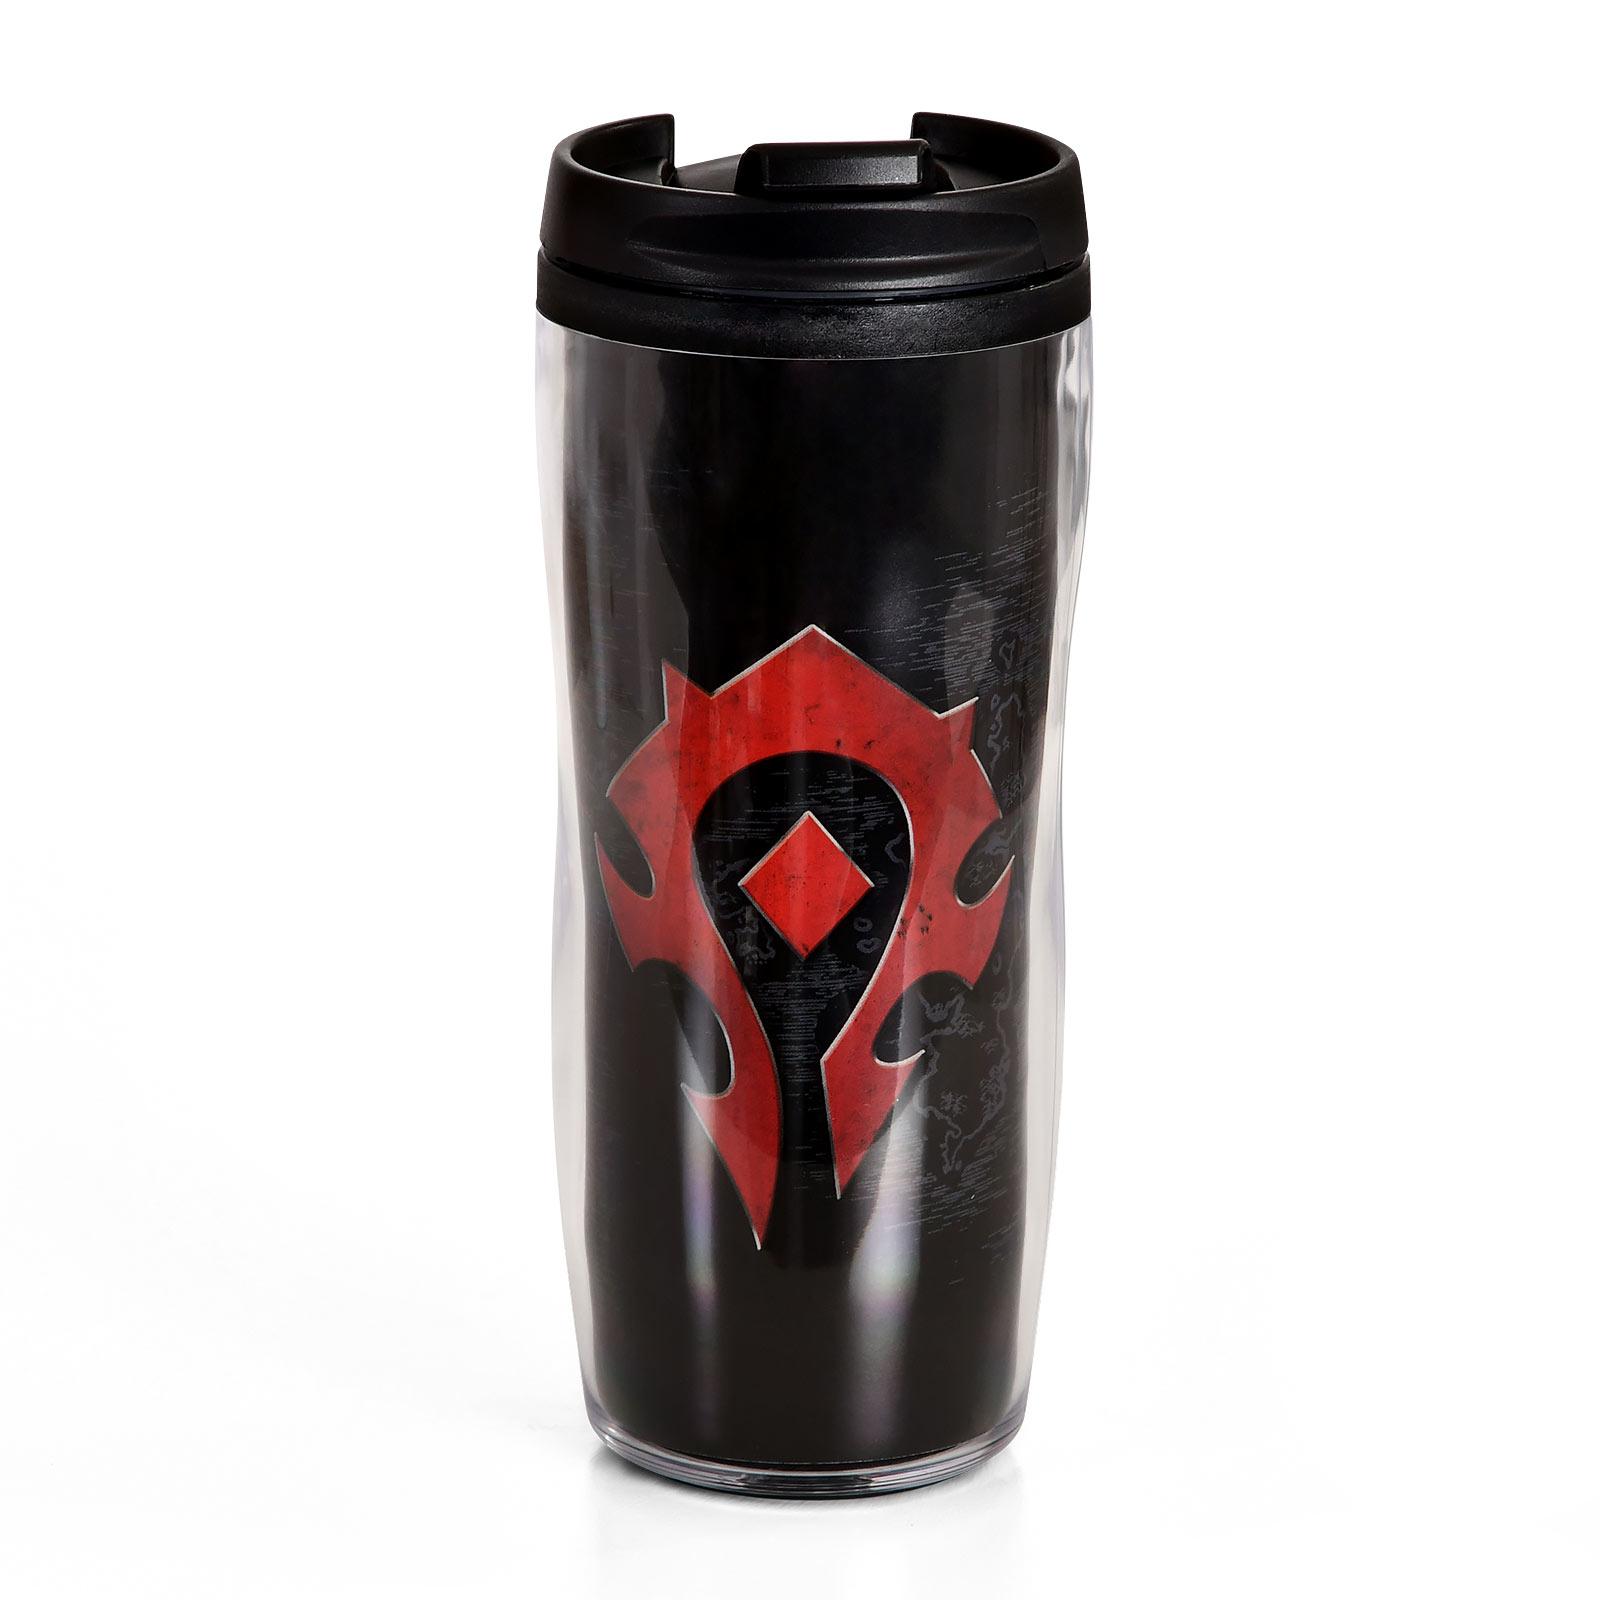 World of Warcraft - Horde Logo To Go Becher